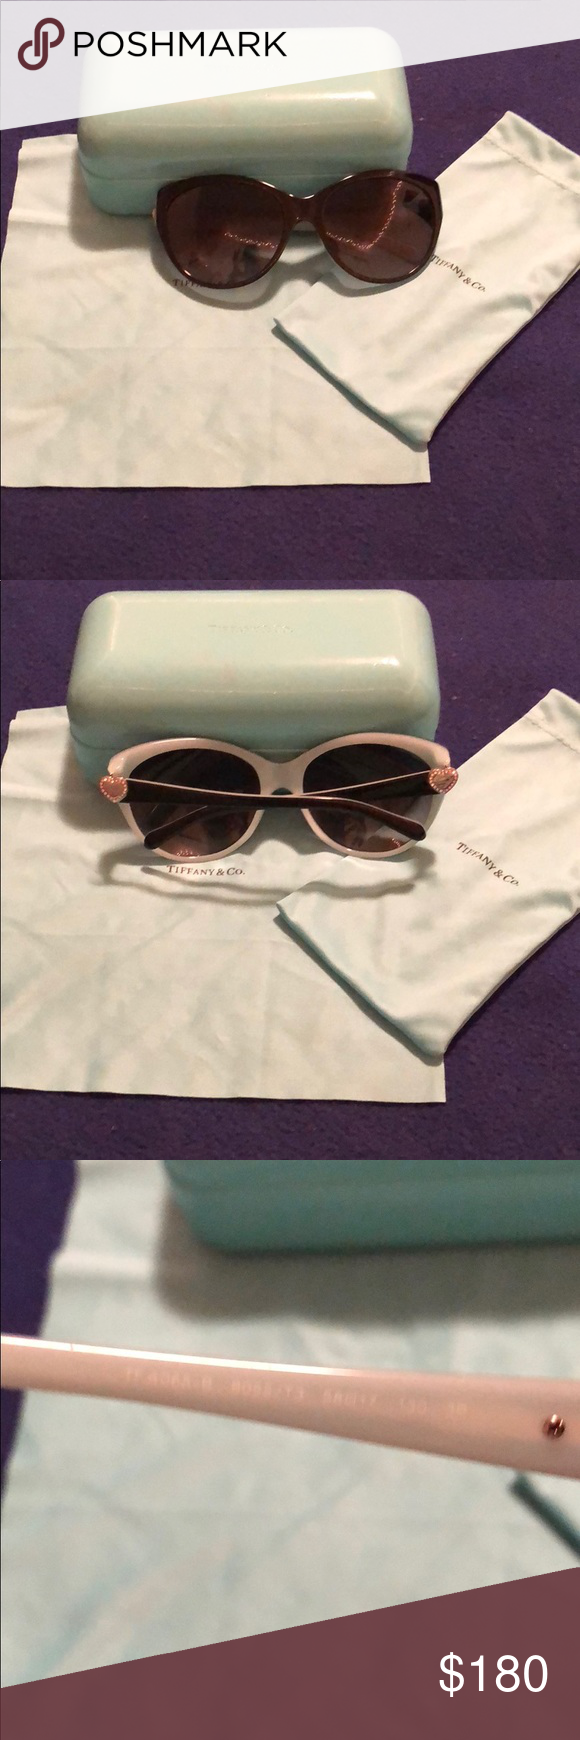 985f1f5a7edd Tiffany Sunglasses Tiffany CatEye Sunglass Style 4065B Black and Tiffany  Blue in Color Classic Tiffany Heart on Temples with Swarovski Crystals (all  still ...